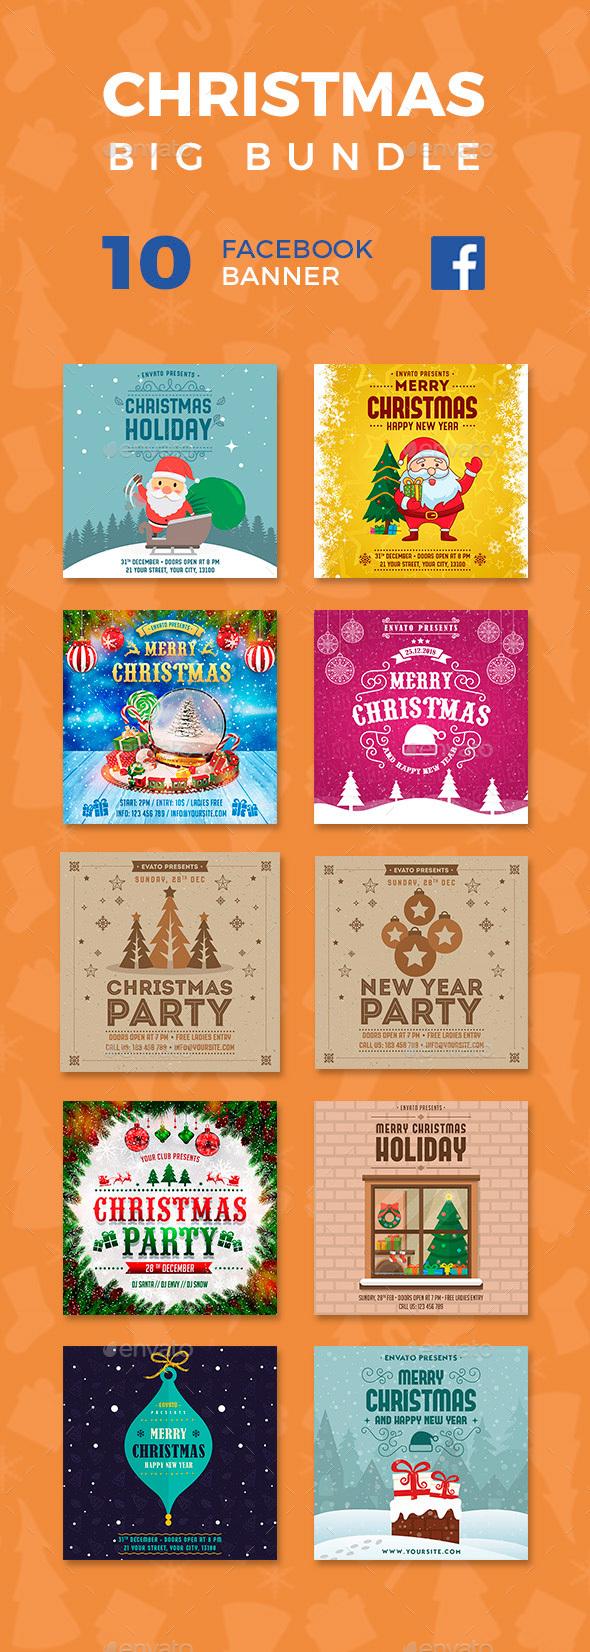 GraphicRiver Christmas Facebook Banners Big Bundle 21121030